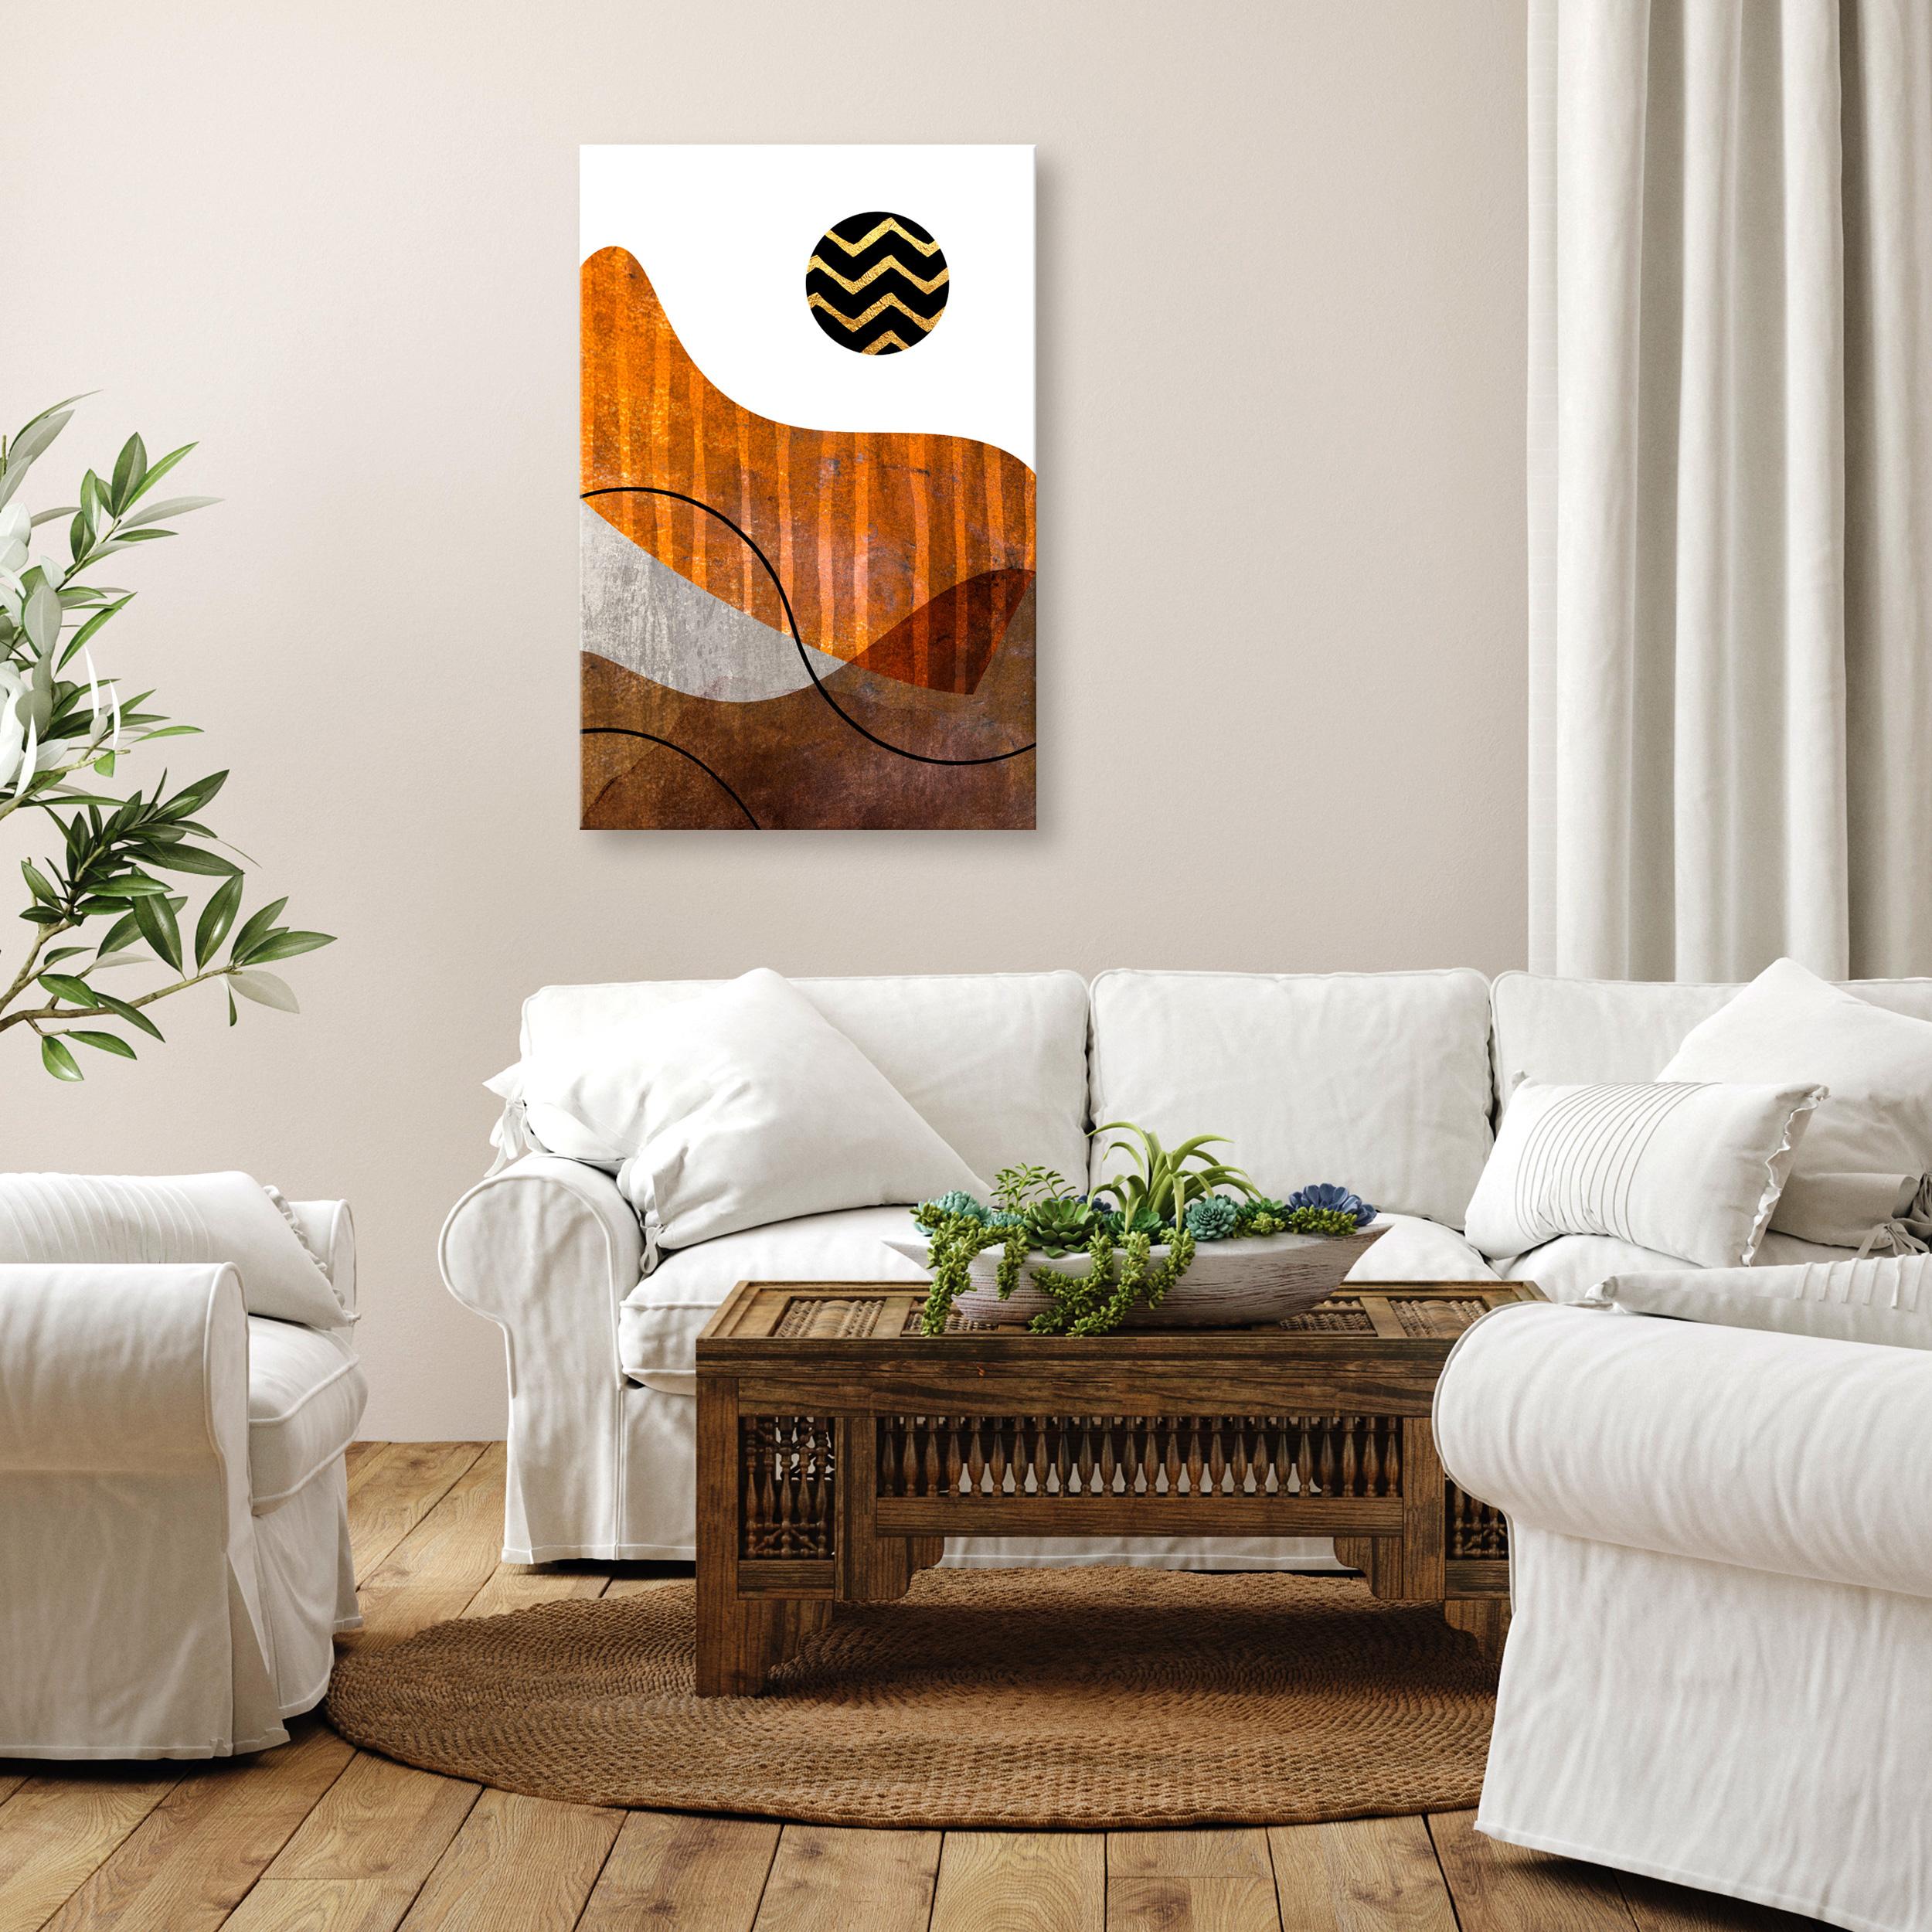 Berge LEINWAND Deko Bilder XXL Wandbilder Natur Abstrakt